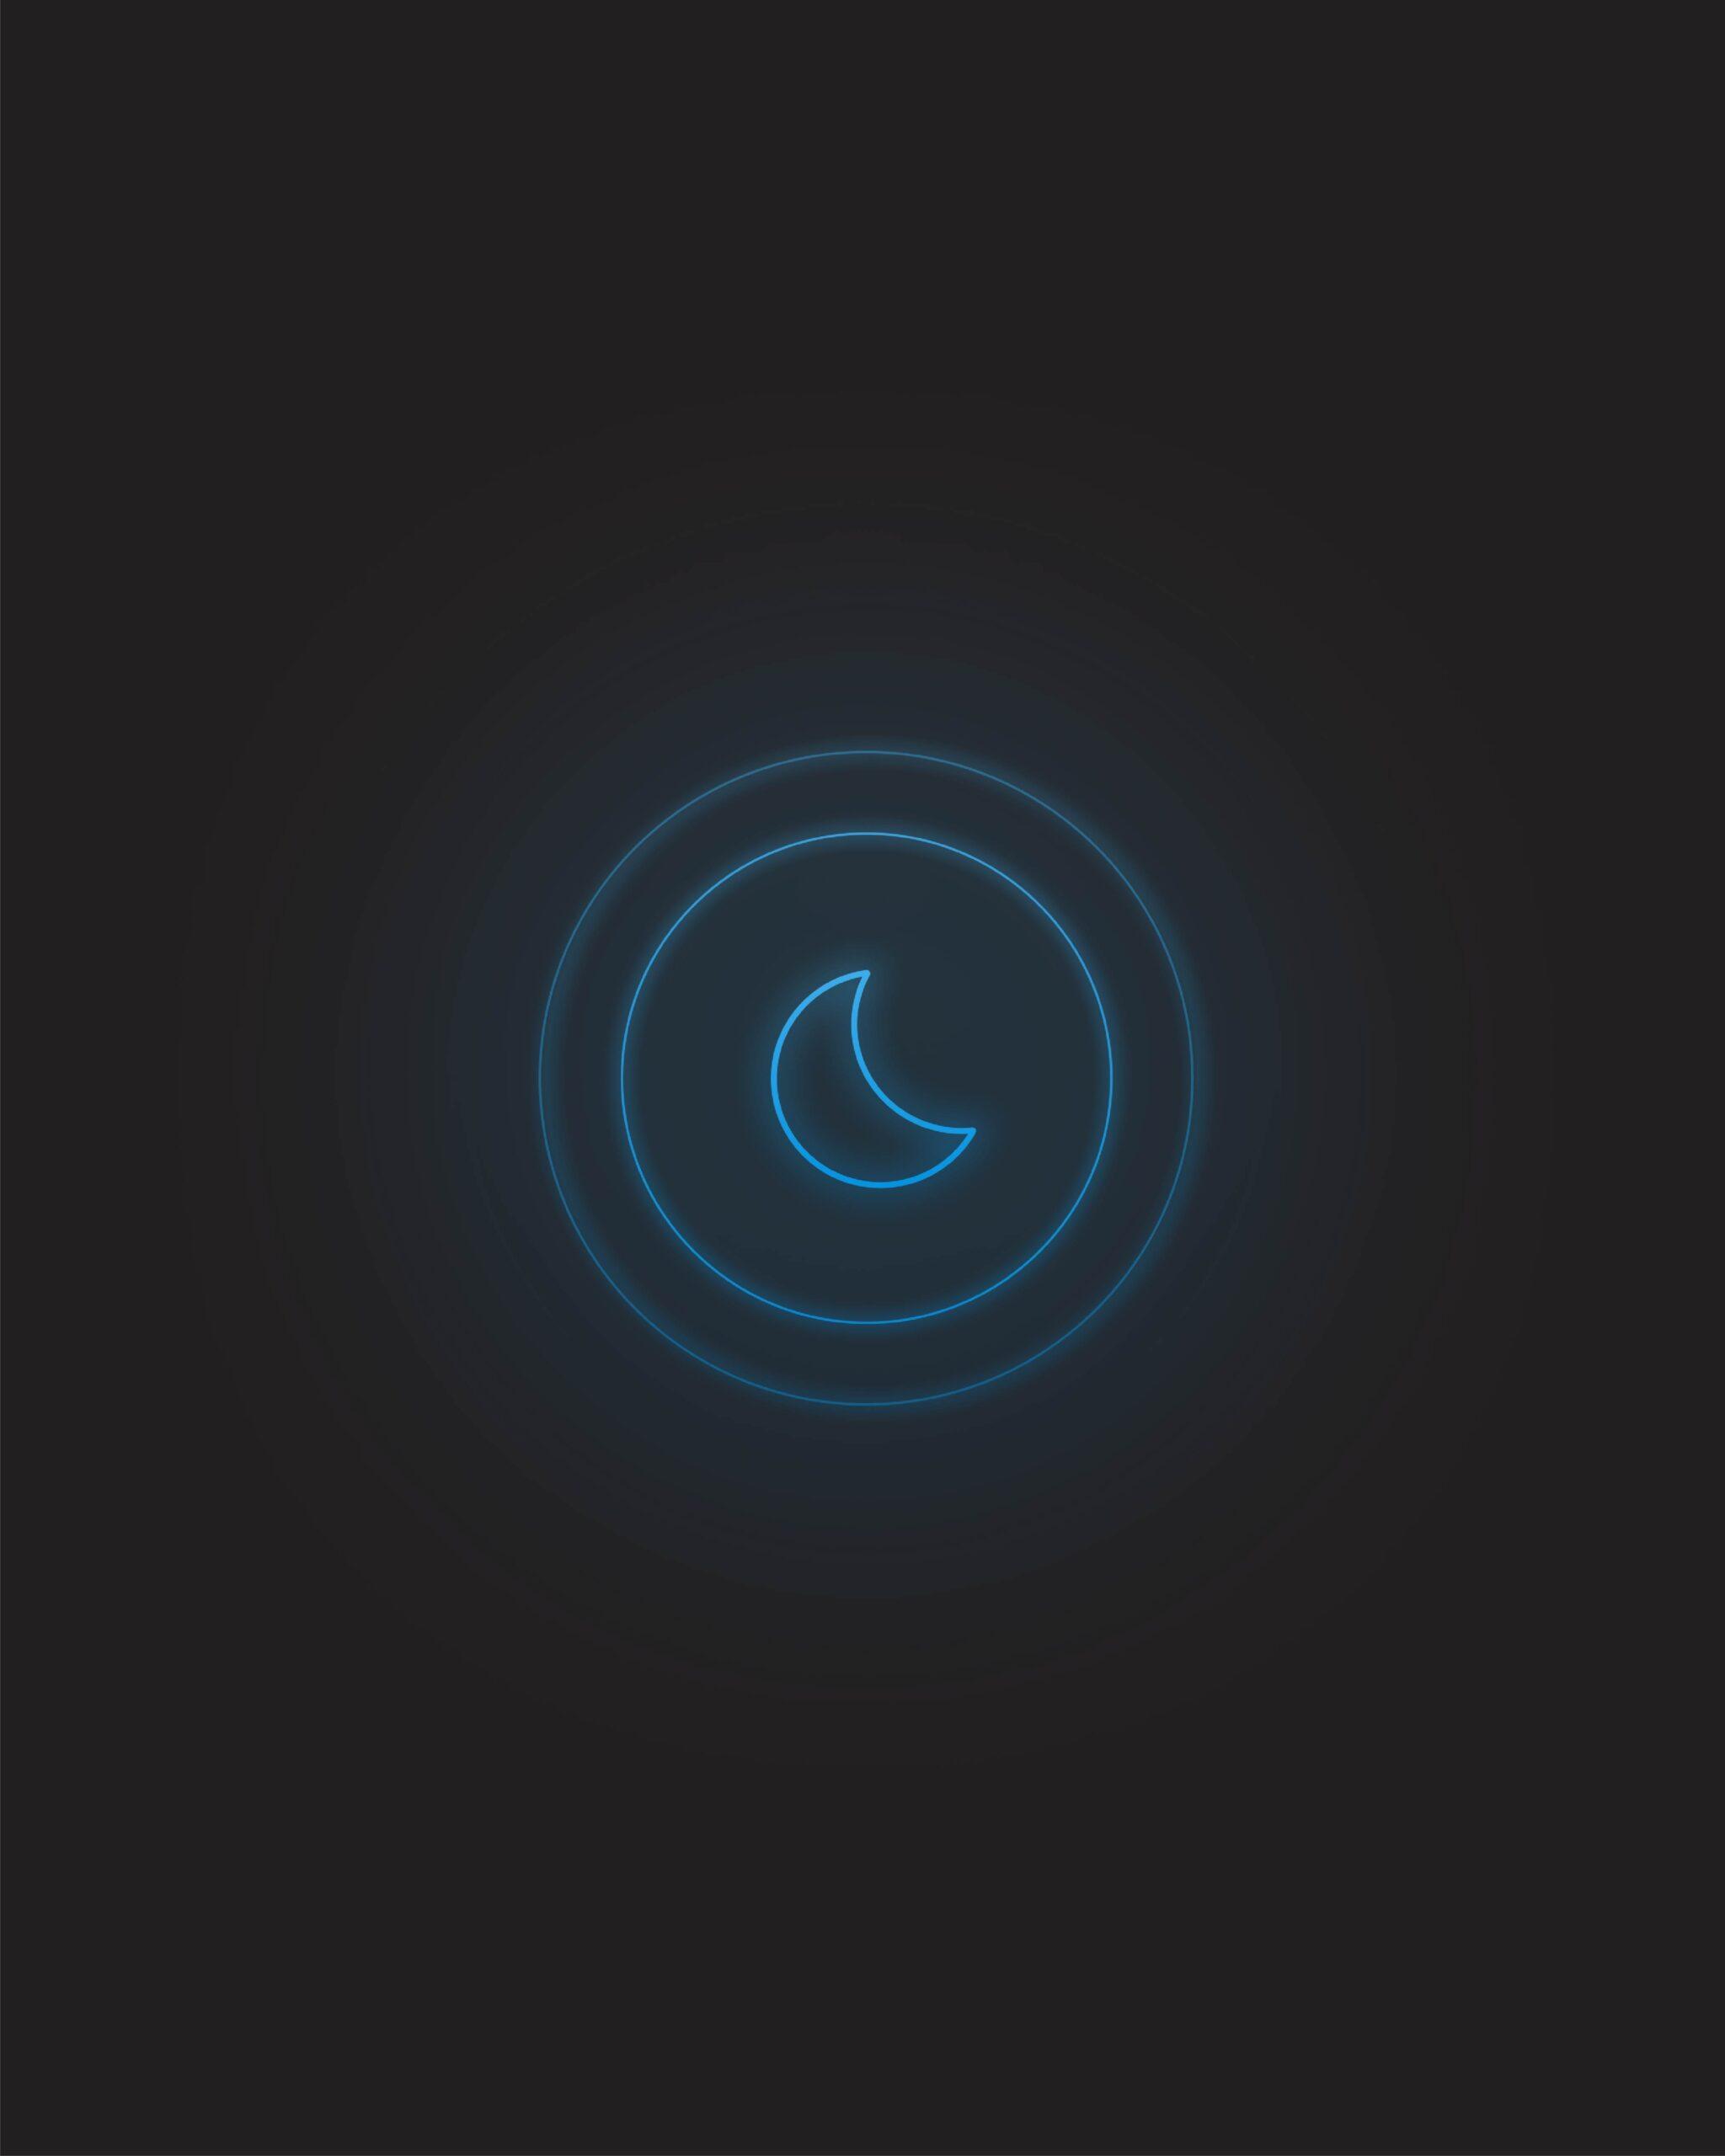 Sleep_icon